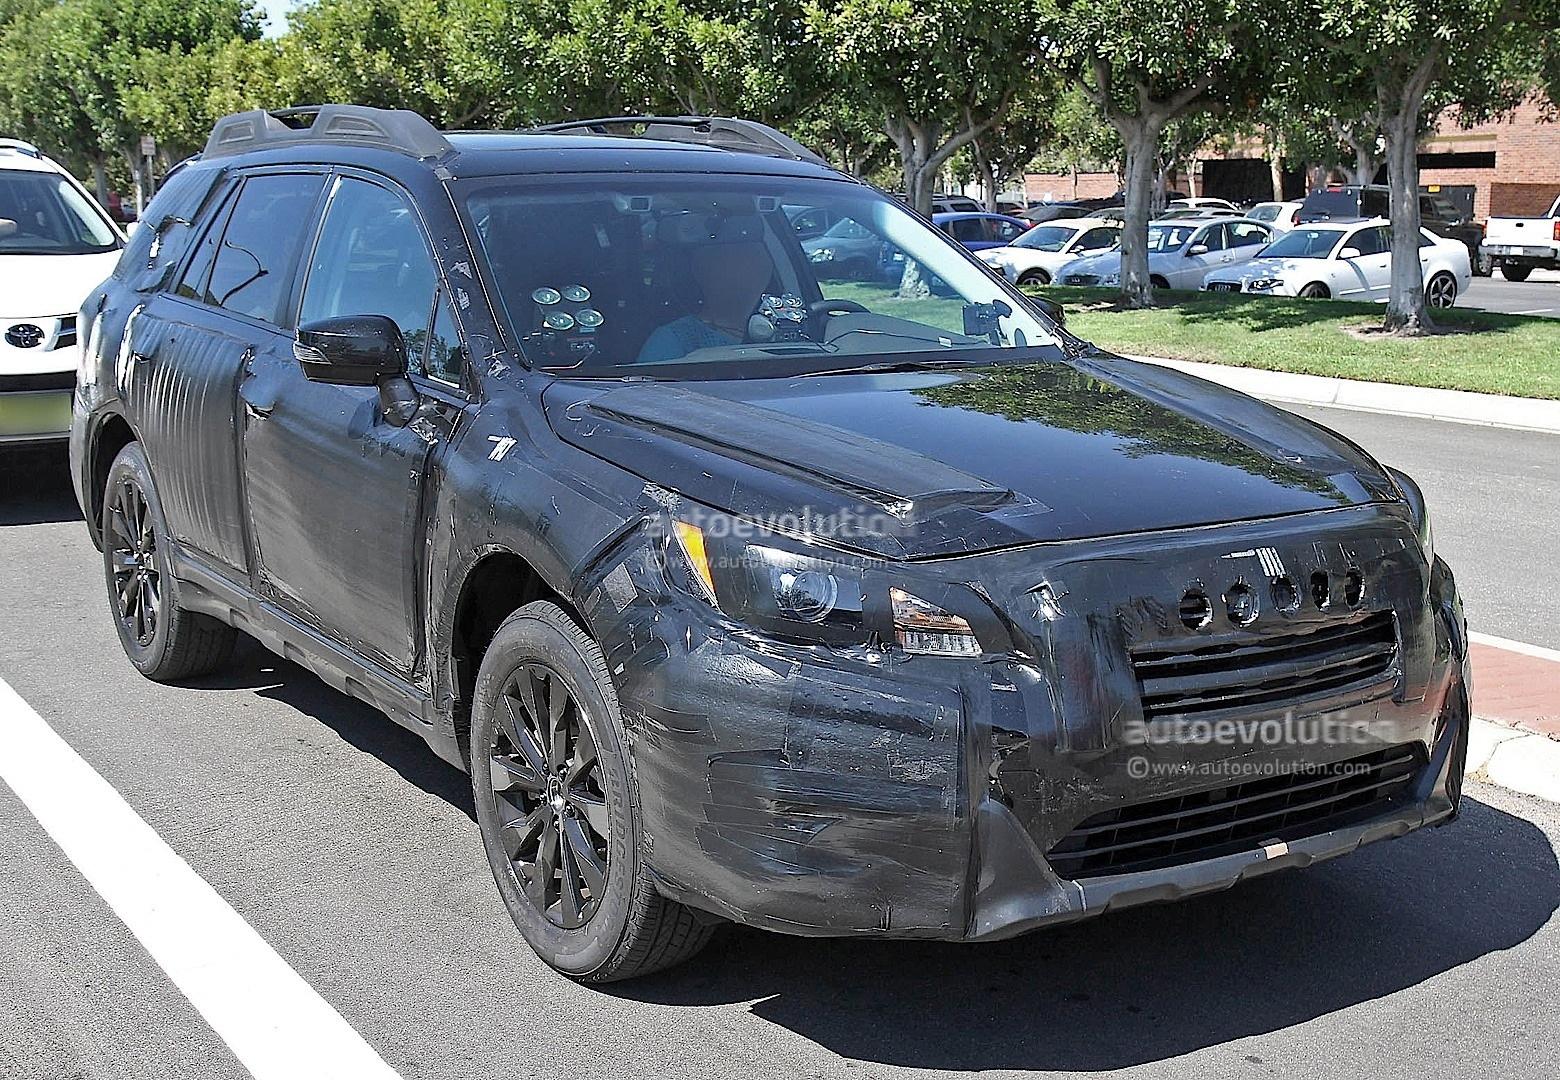 Spyshots: 2015 Subaru Outback